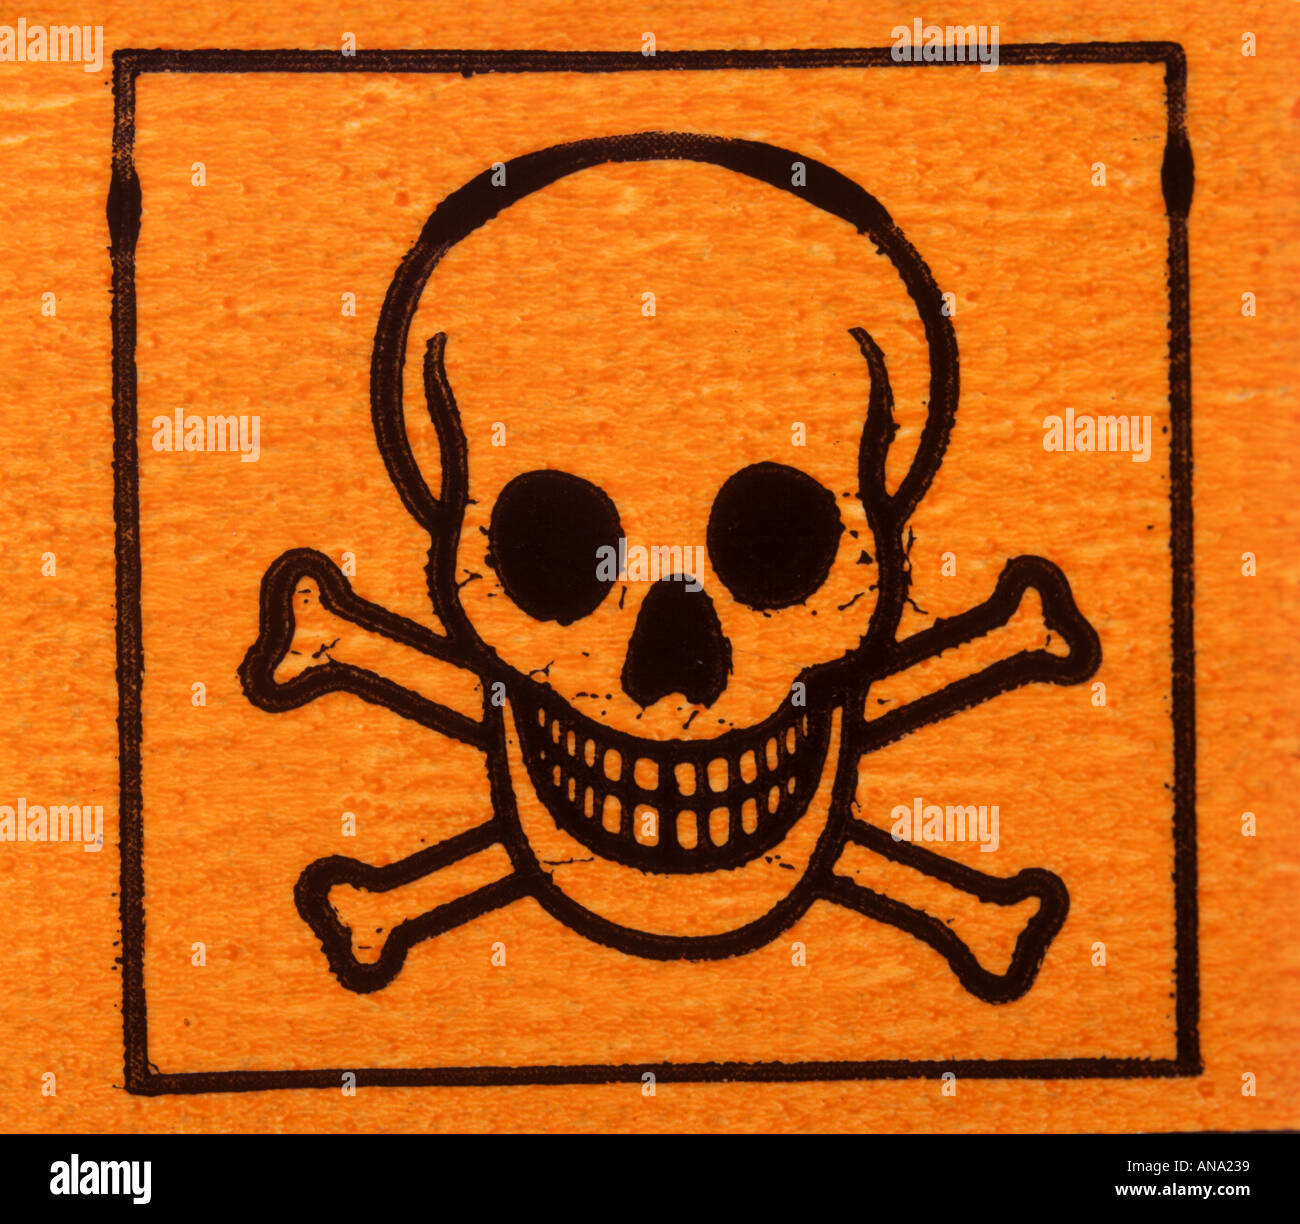 Hazard symbol for toxic substance hazchem stock photo royalty hazard symbol for toxic substance hazchem biocorpaavc